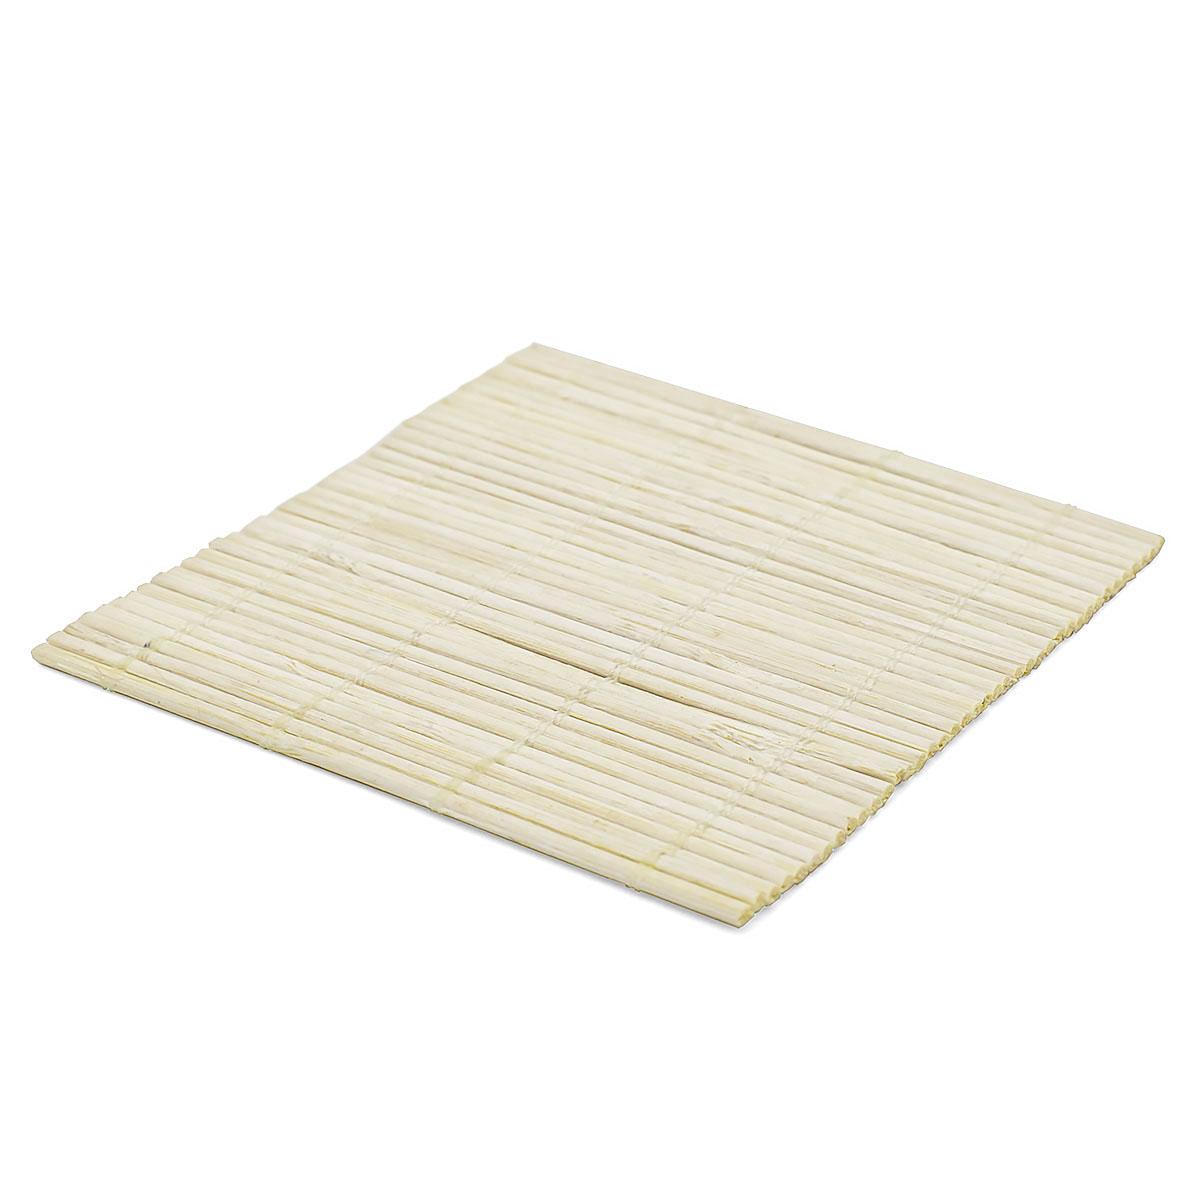 Набор чайных циновок (бамбук), неокрашенные, 10 х 10 см, 5 шт/упак набор чайных циновок бамбук красные двухцветные 10 х 10 см 5 шт упак